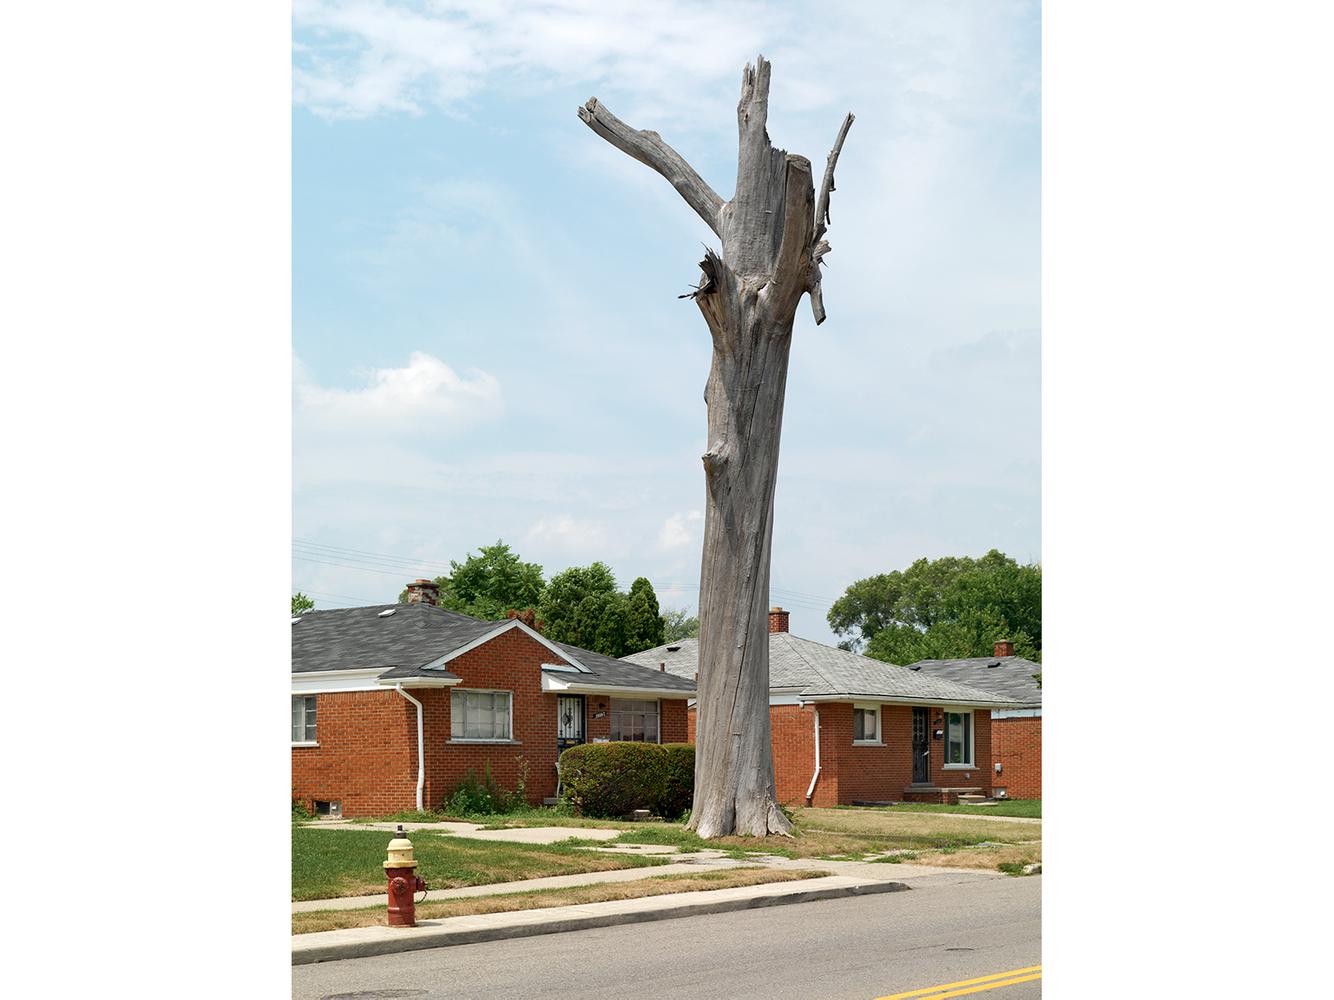 Tree Stump 1, Detroit 2010